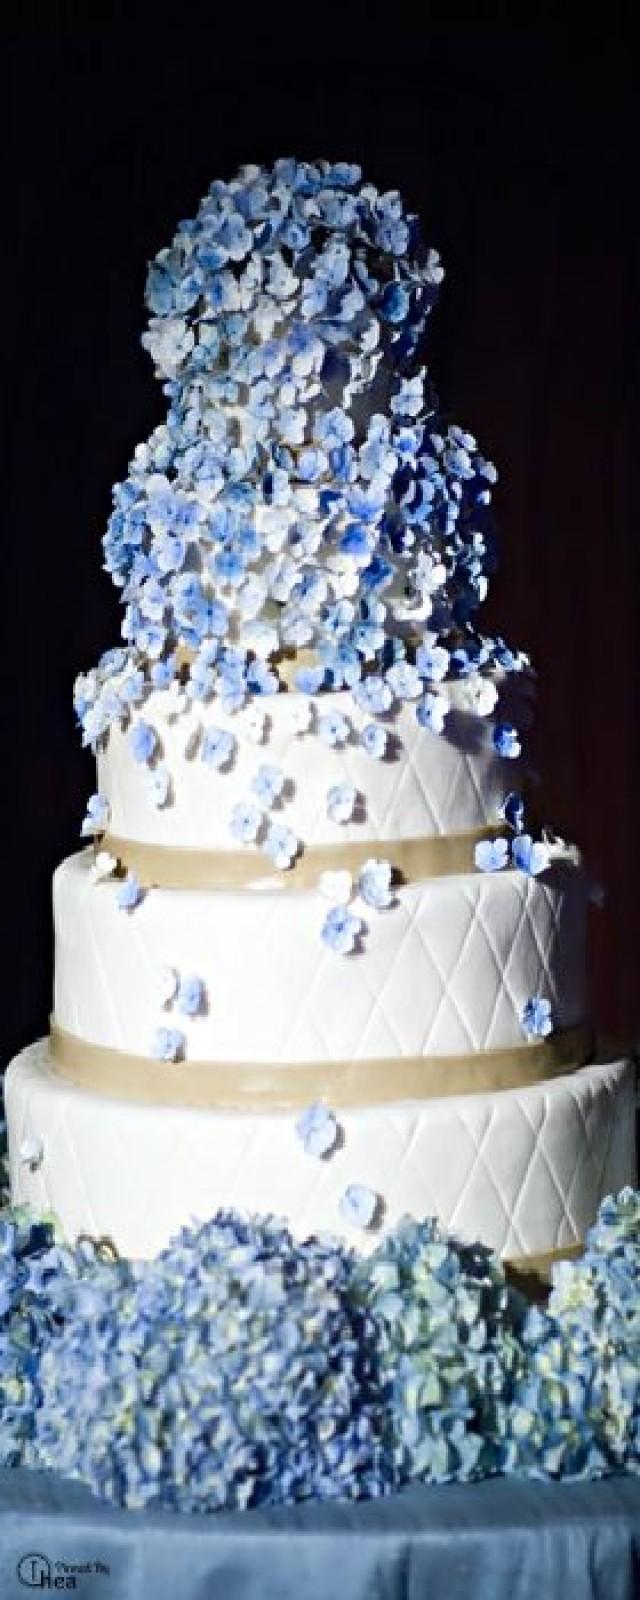 Wedding Cupcakes - Stunning Wedding Cake & Cupcake Ideas #2137168 ...